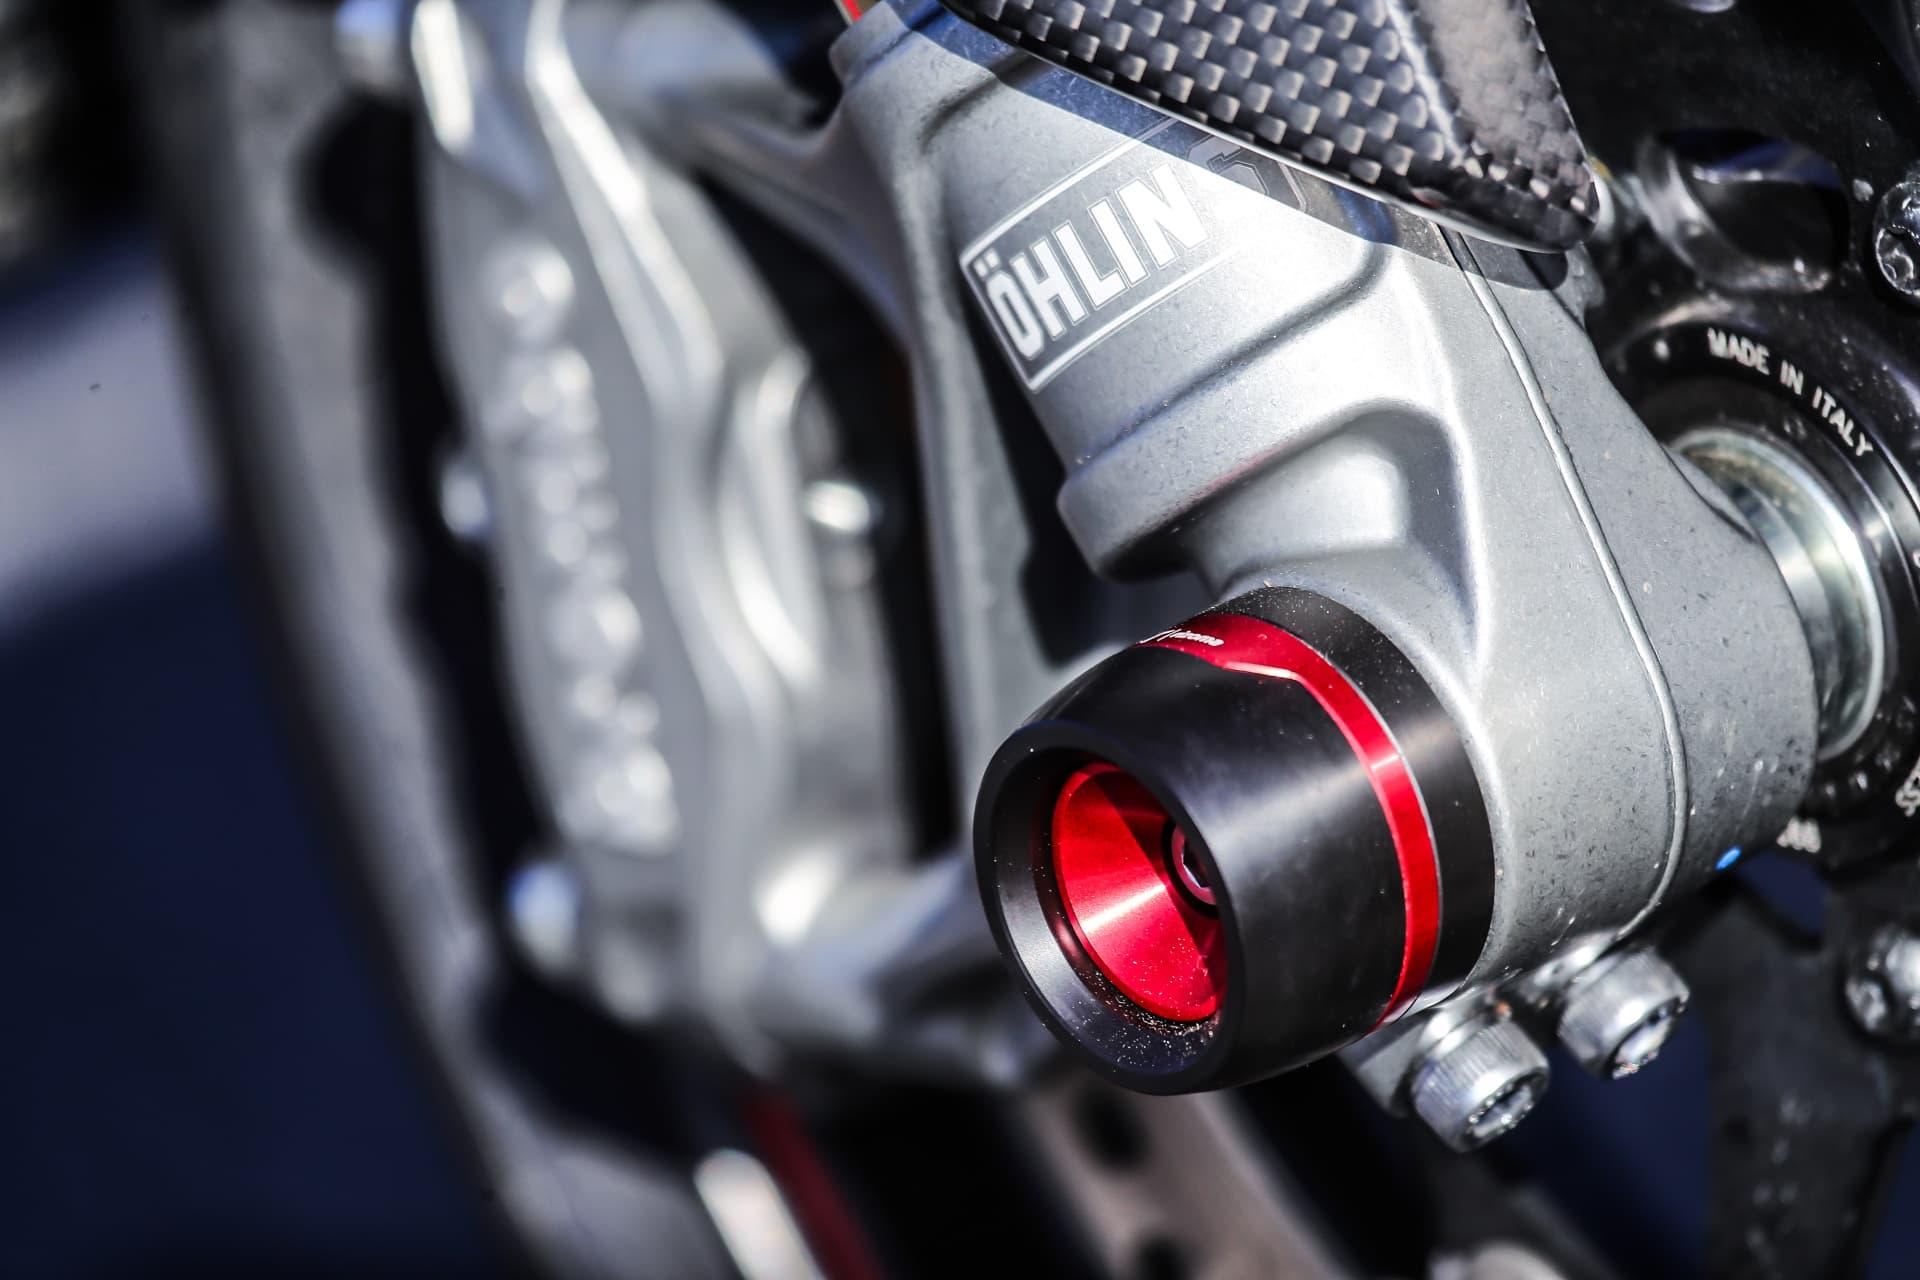 Ducati Hypermotard 950 Sp Static 25 Uc70325 Mid